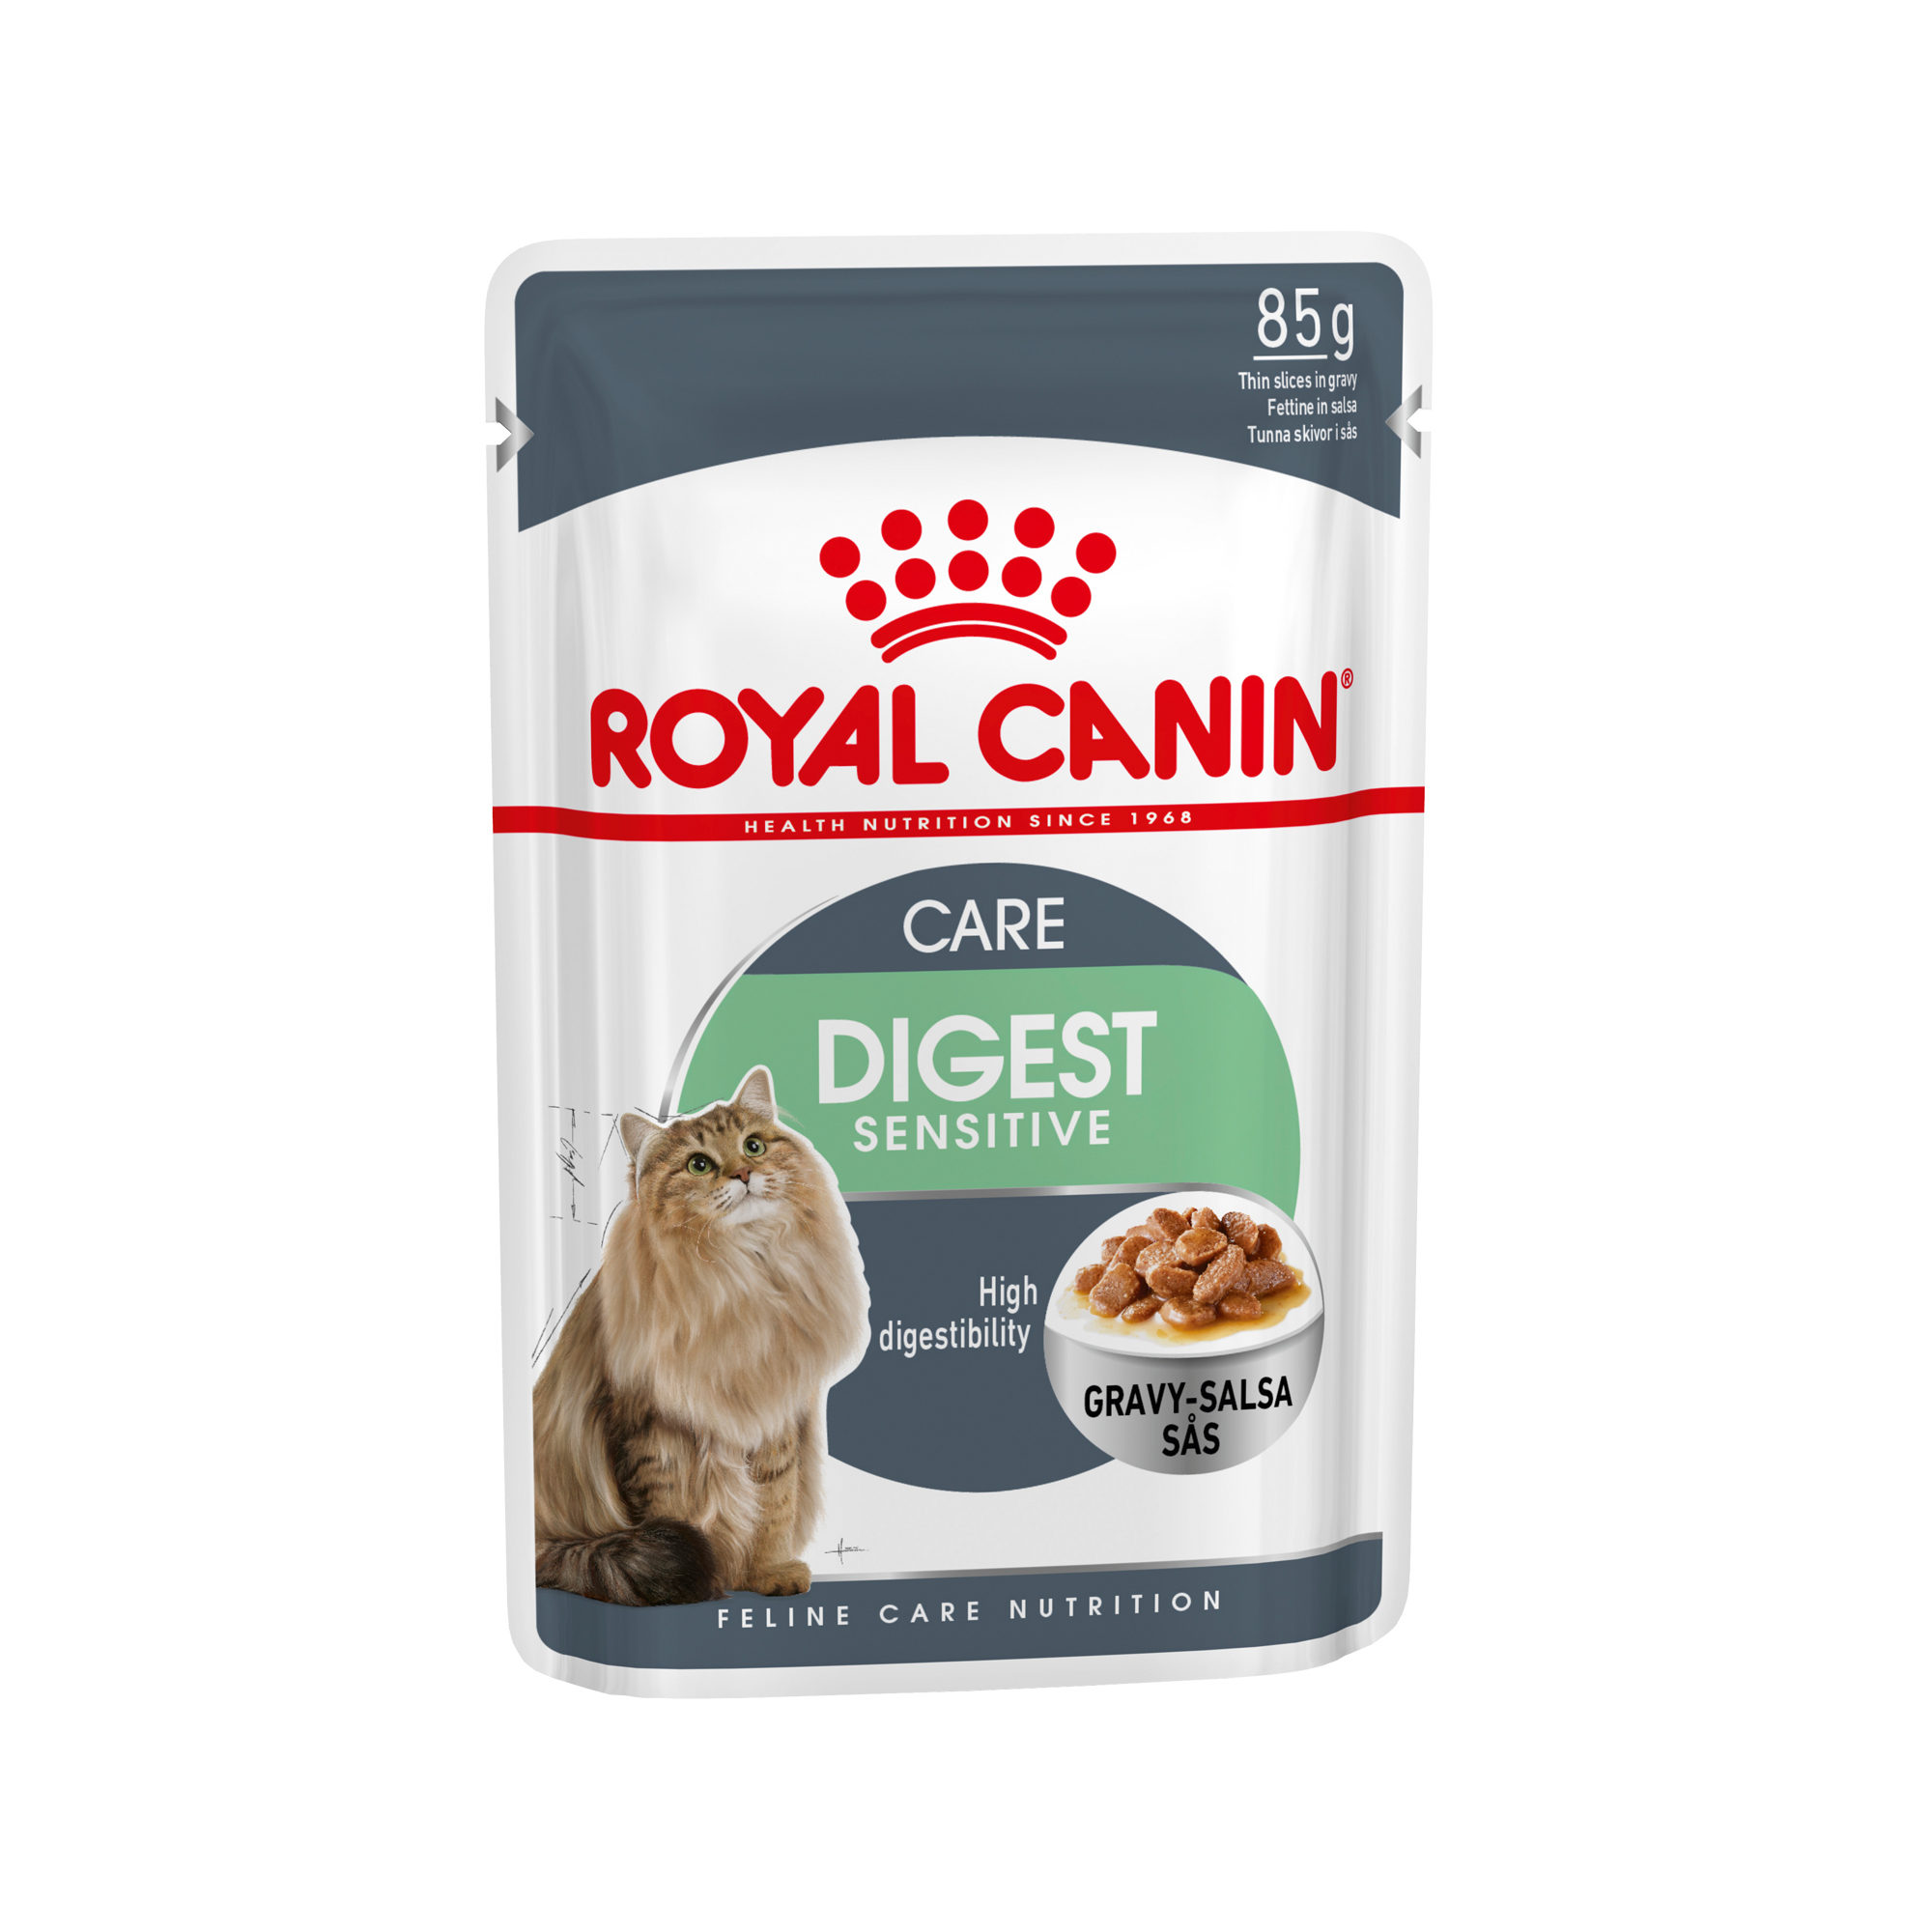 Royal Canin Digest Sensitive in Gravy Katzenfutter - Frischebeutel